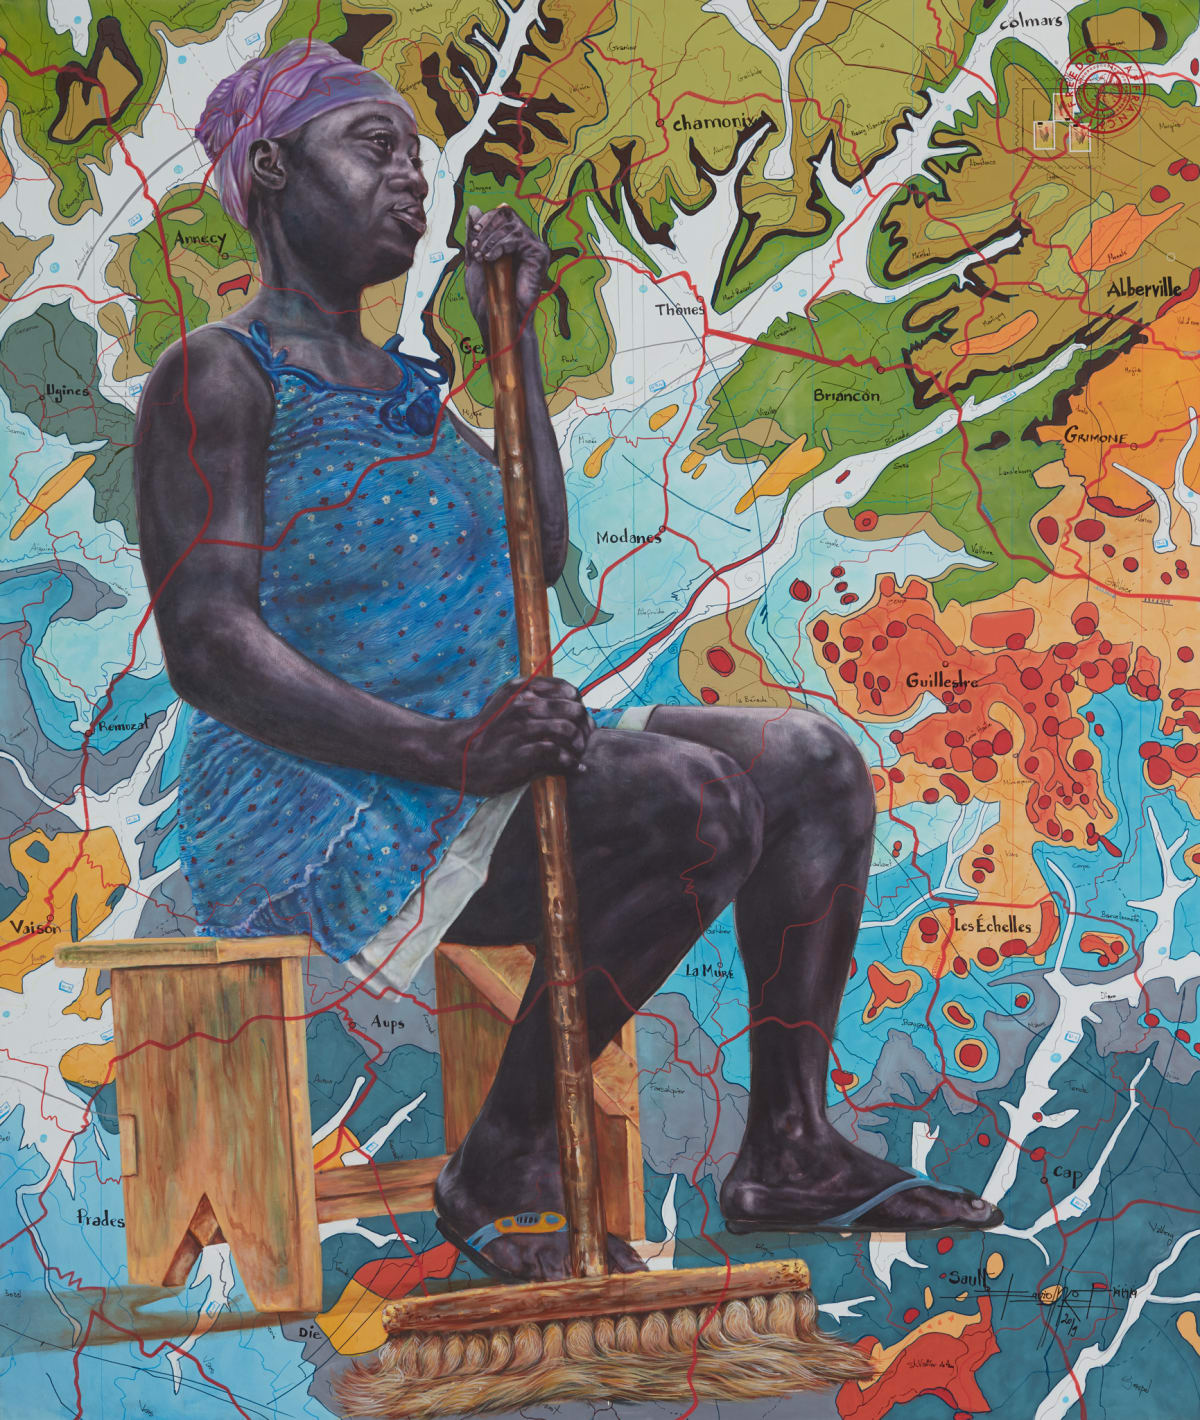 Jean David Nkot, ##The Woman Power.org.com, 2019